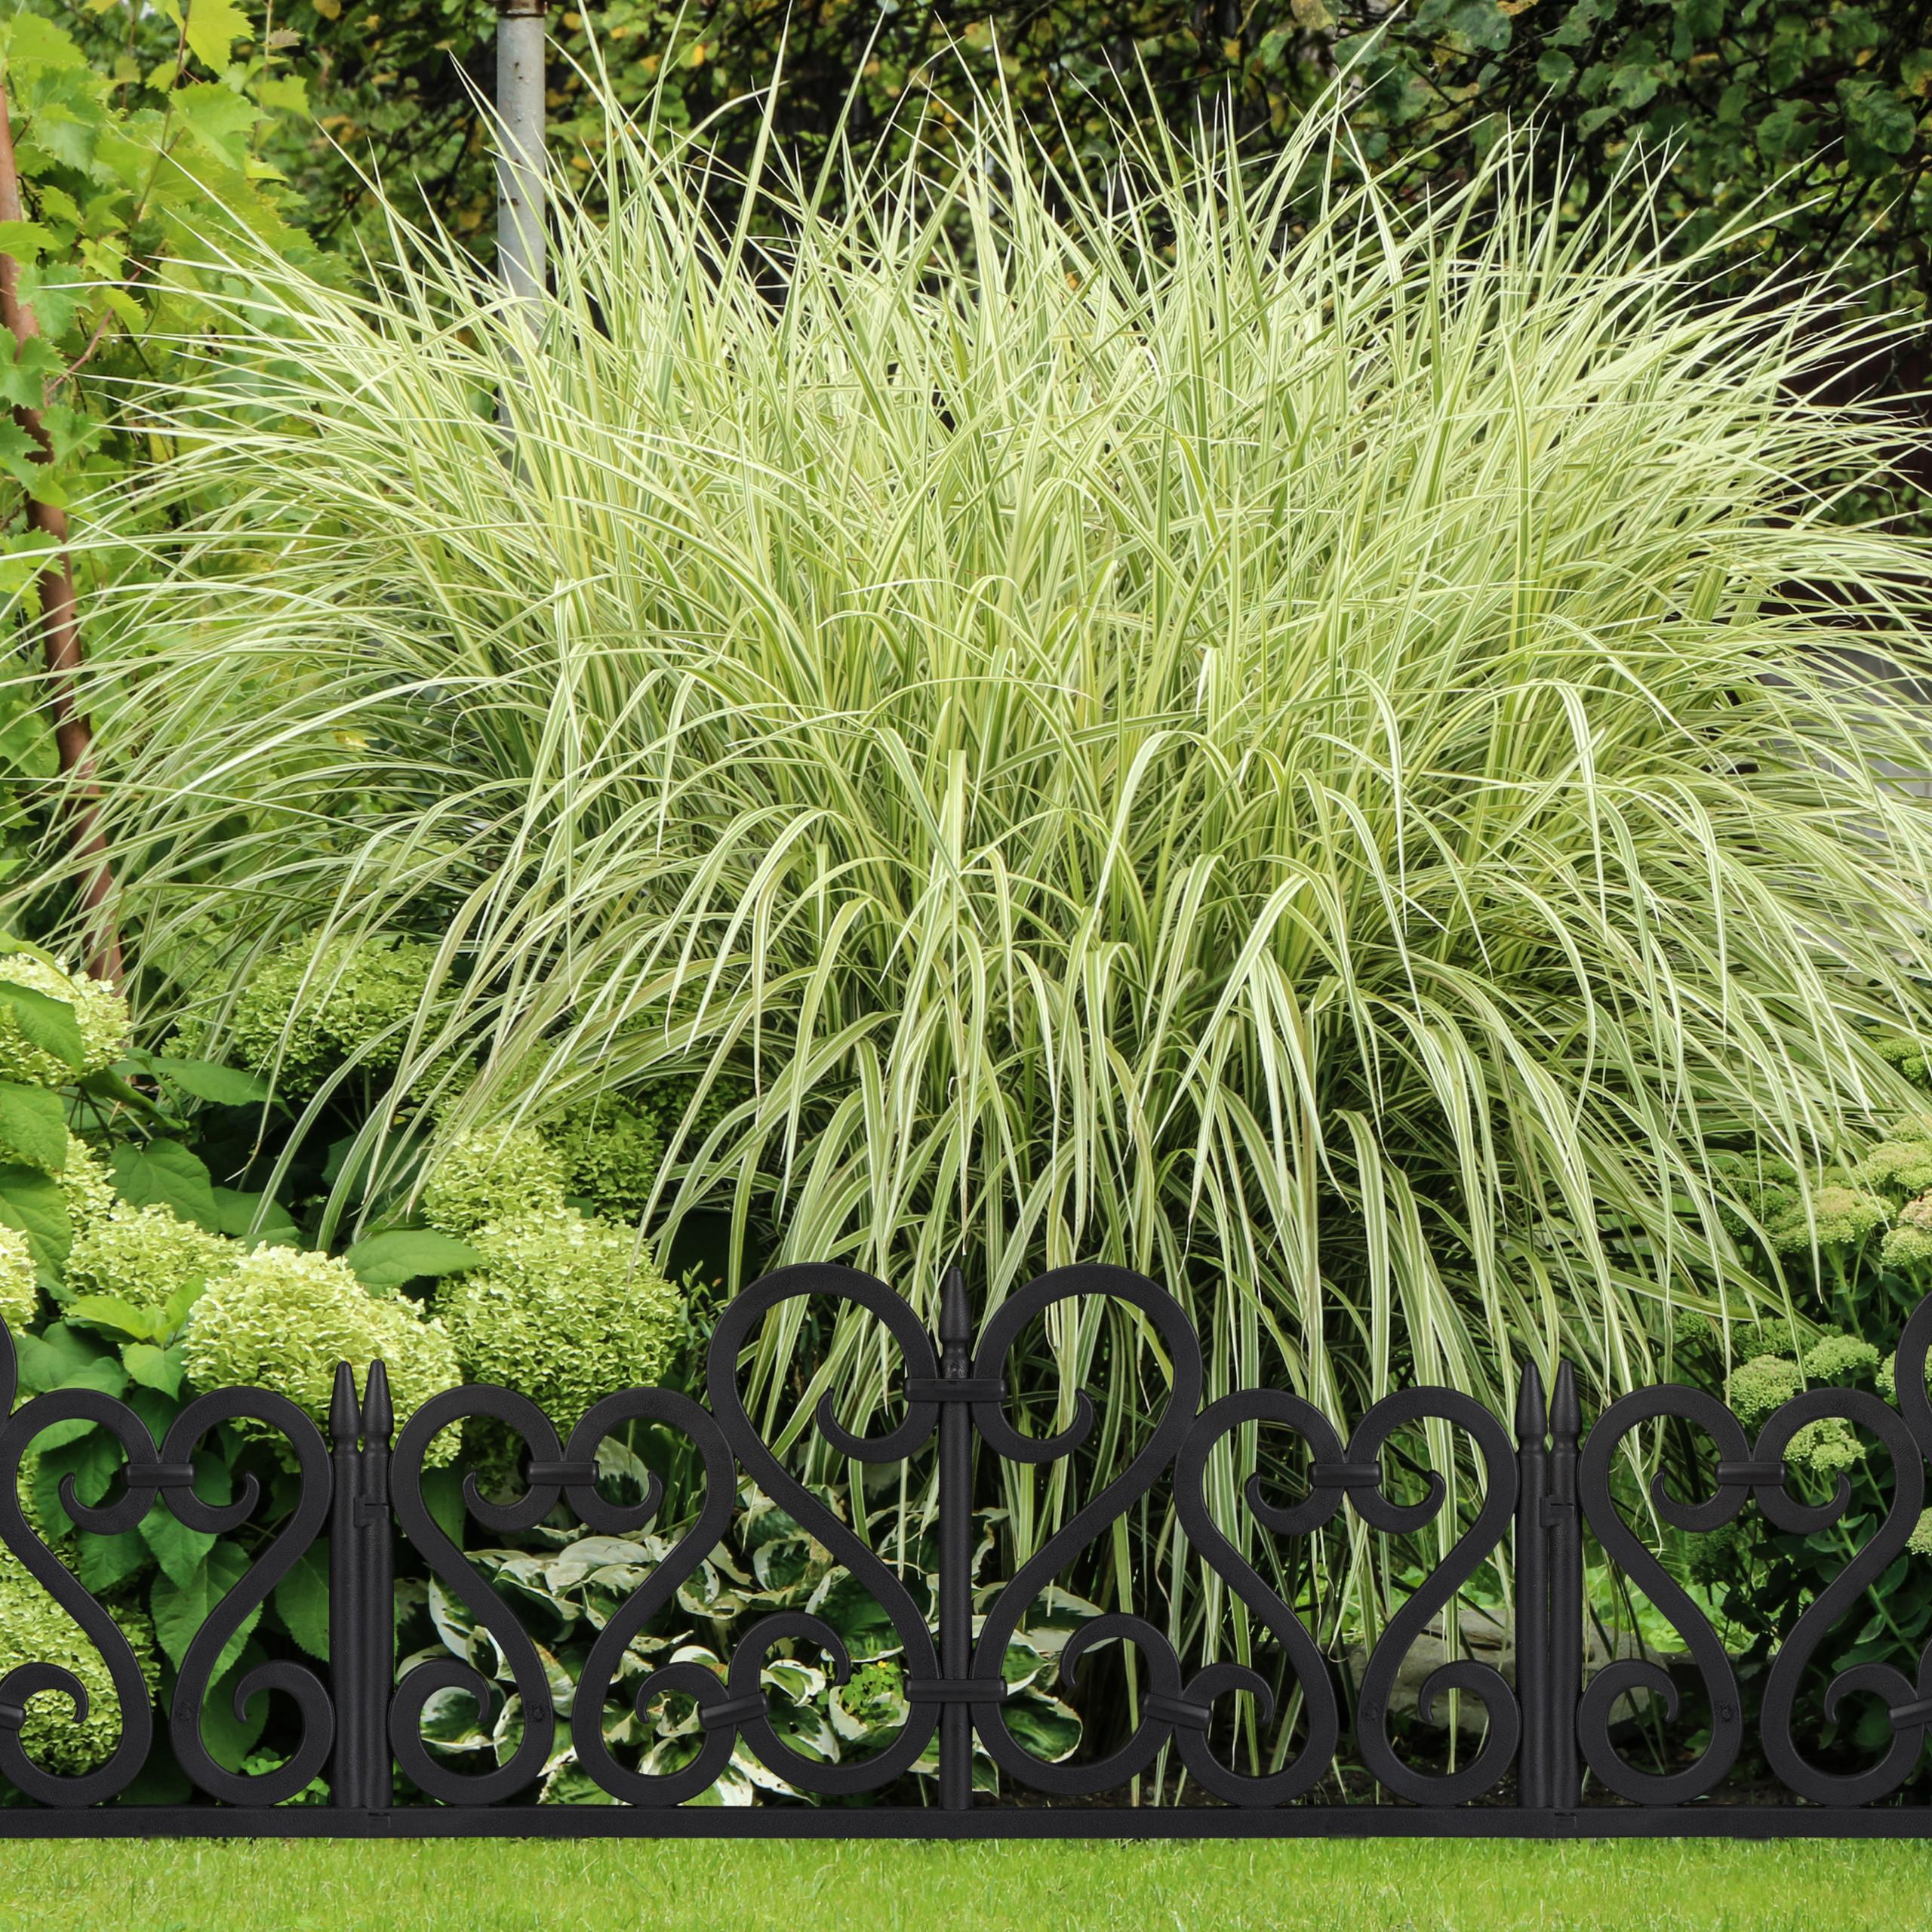 Valla-jardin-Borde-cesped-Bordillo-limitador-jardin-Set-4-separadores-cesped miniatura 11